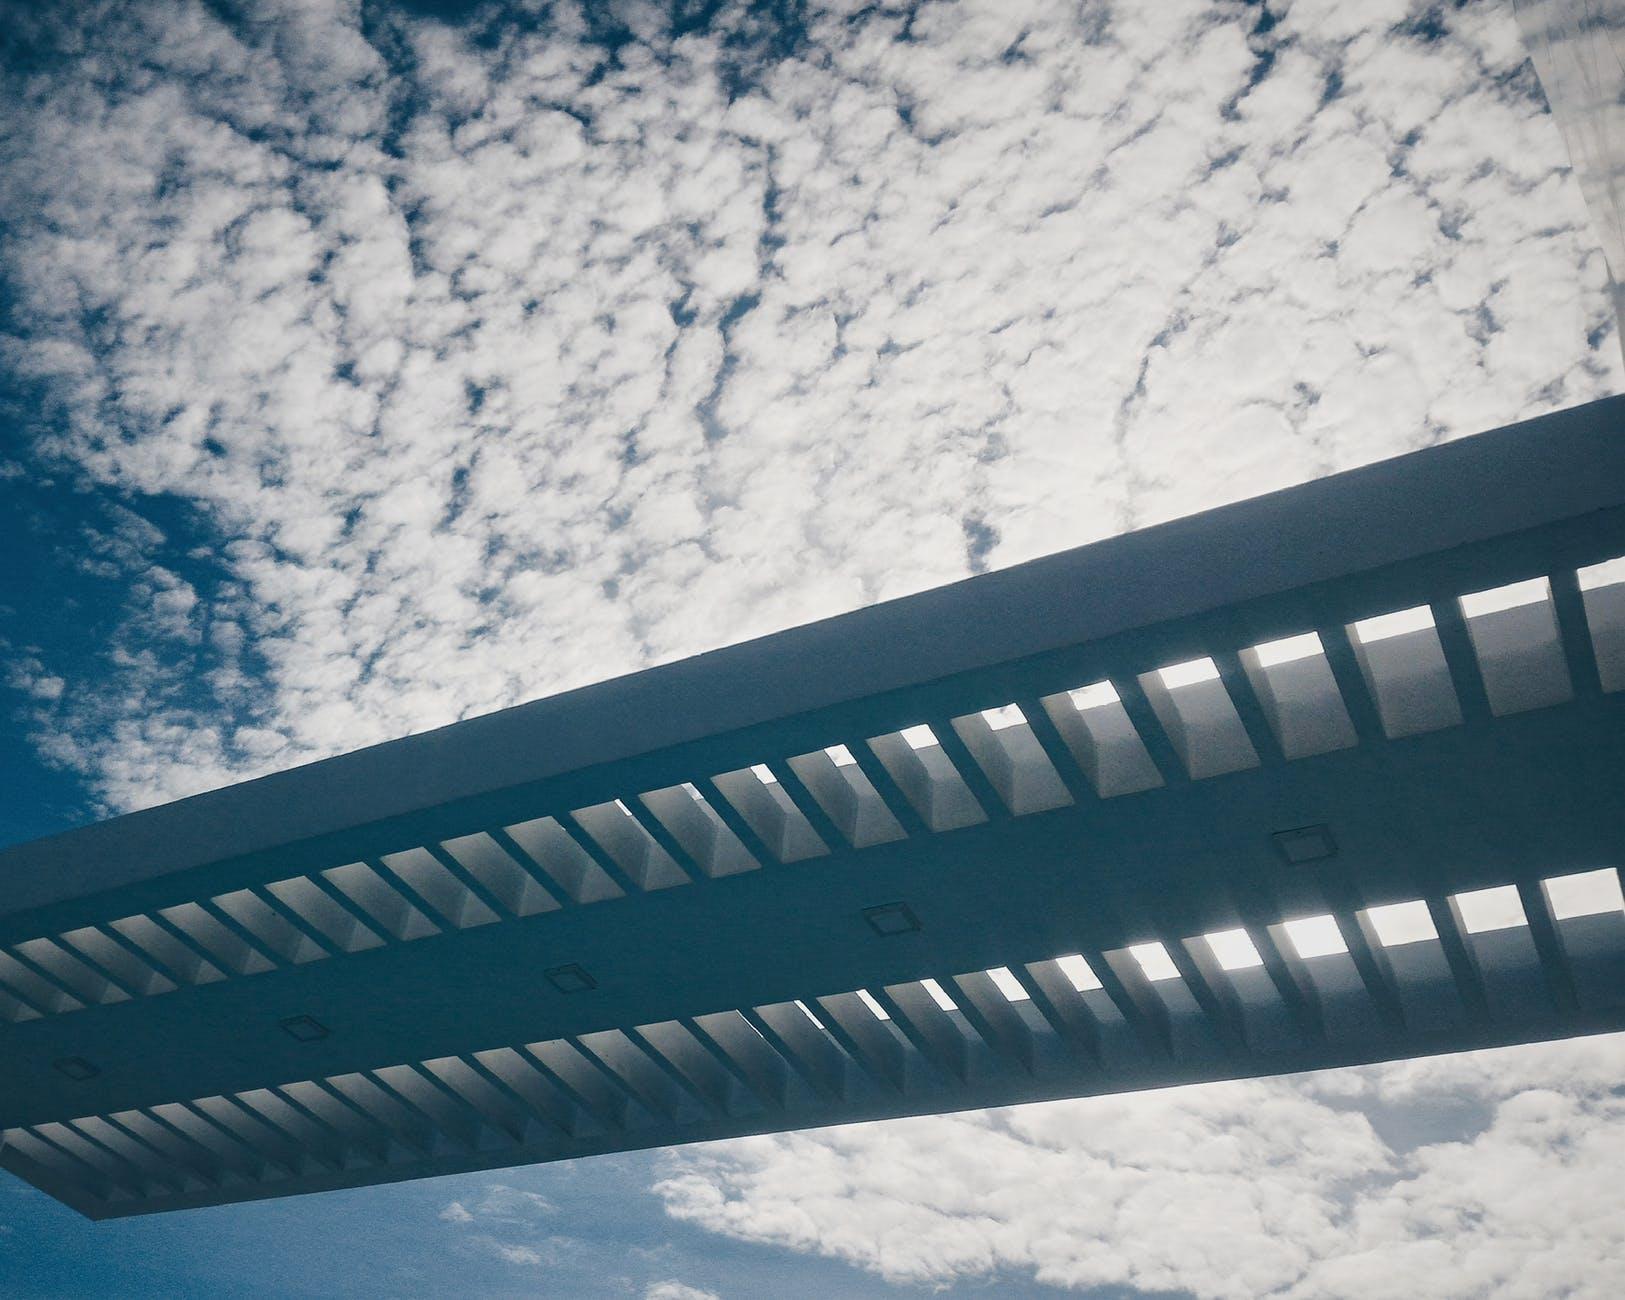 Silhouette of bridge under cloudy sky photo